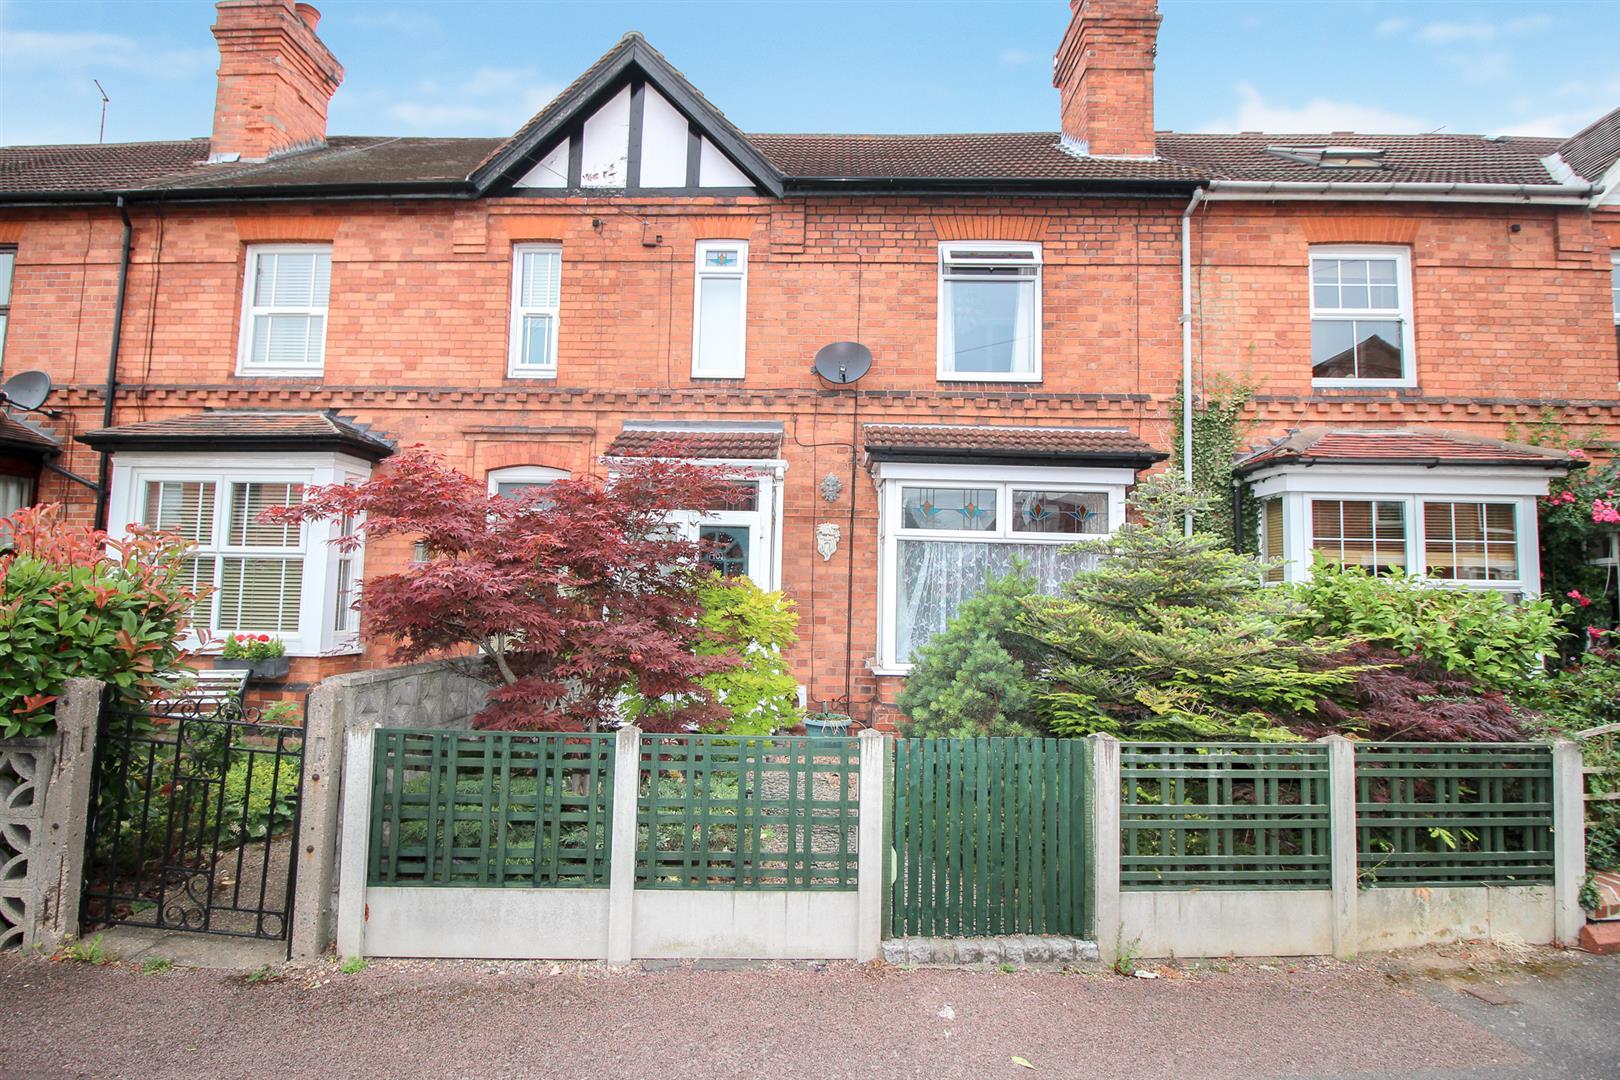 3 Bedrooms House for sale in Newton Street, Beeston